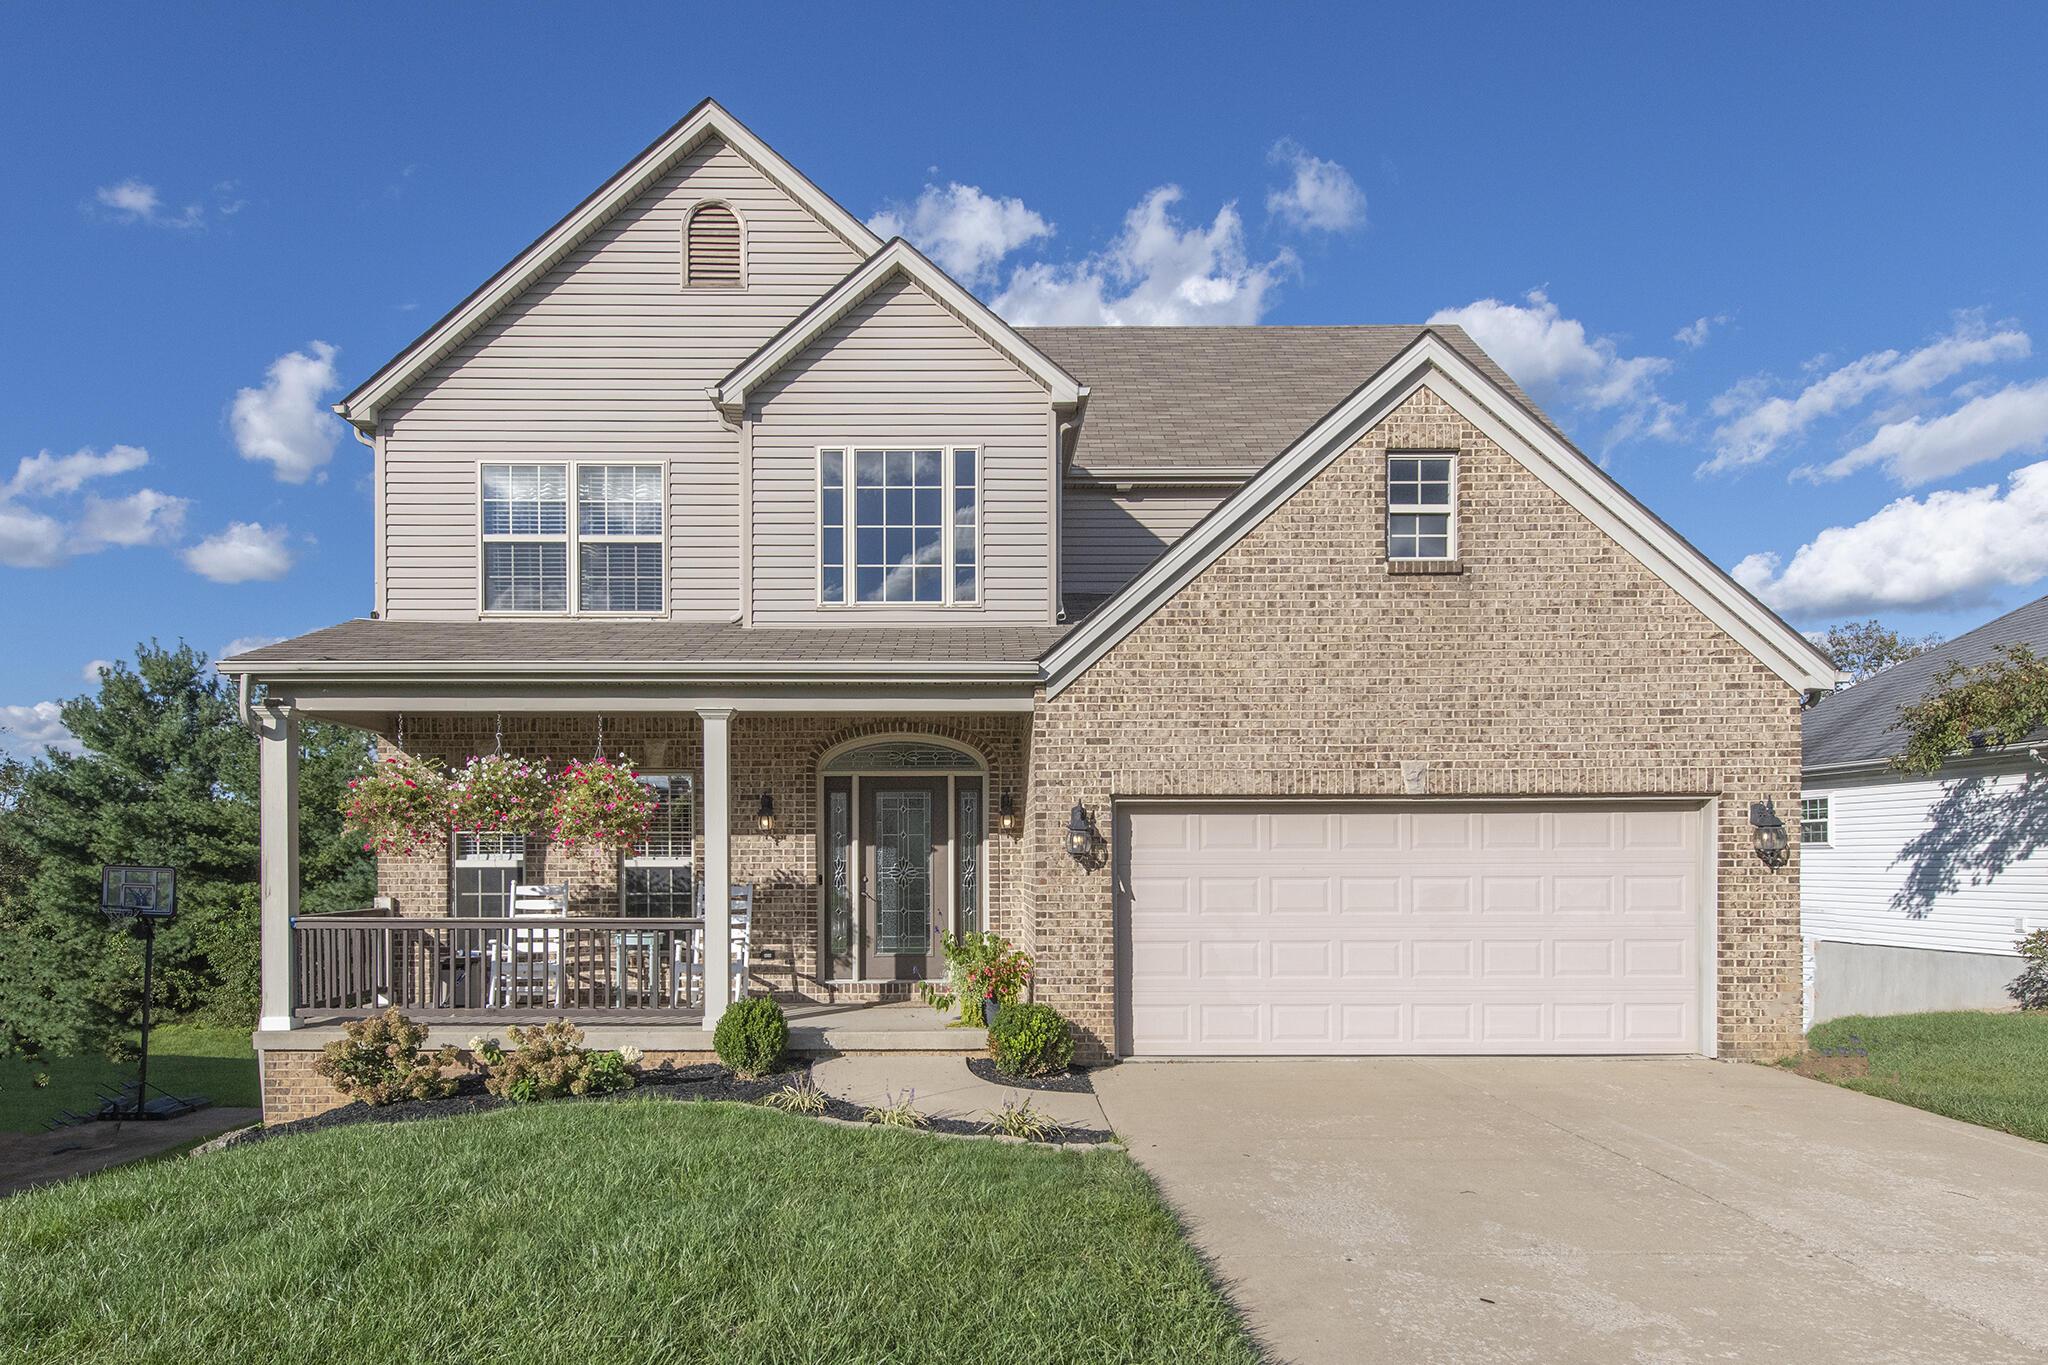 629 Ridge View Drive, Nicholasville, Kentucky 40356, 4 Bedrooms Bedrooms, ,2 BathroomsBathrooms,Residential,For Sale,Ridge View,20120692